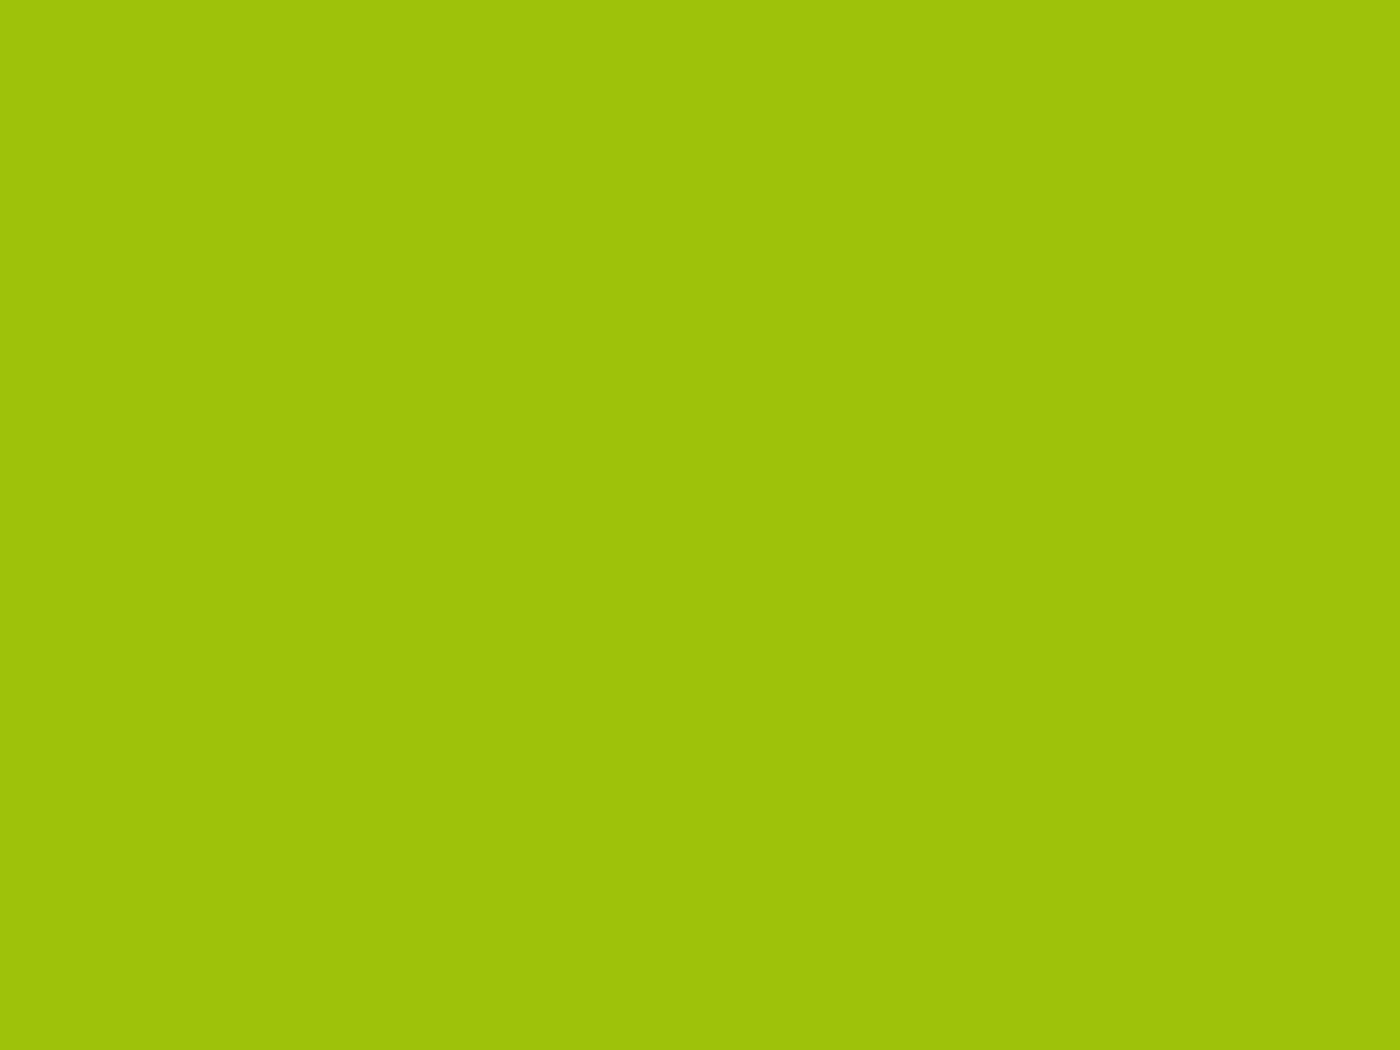 1400x1050 Limerick Solid Color Background